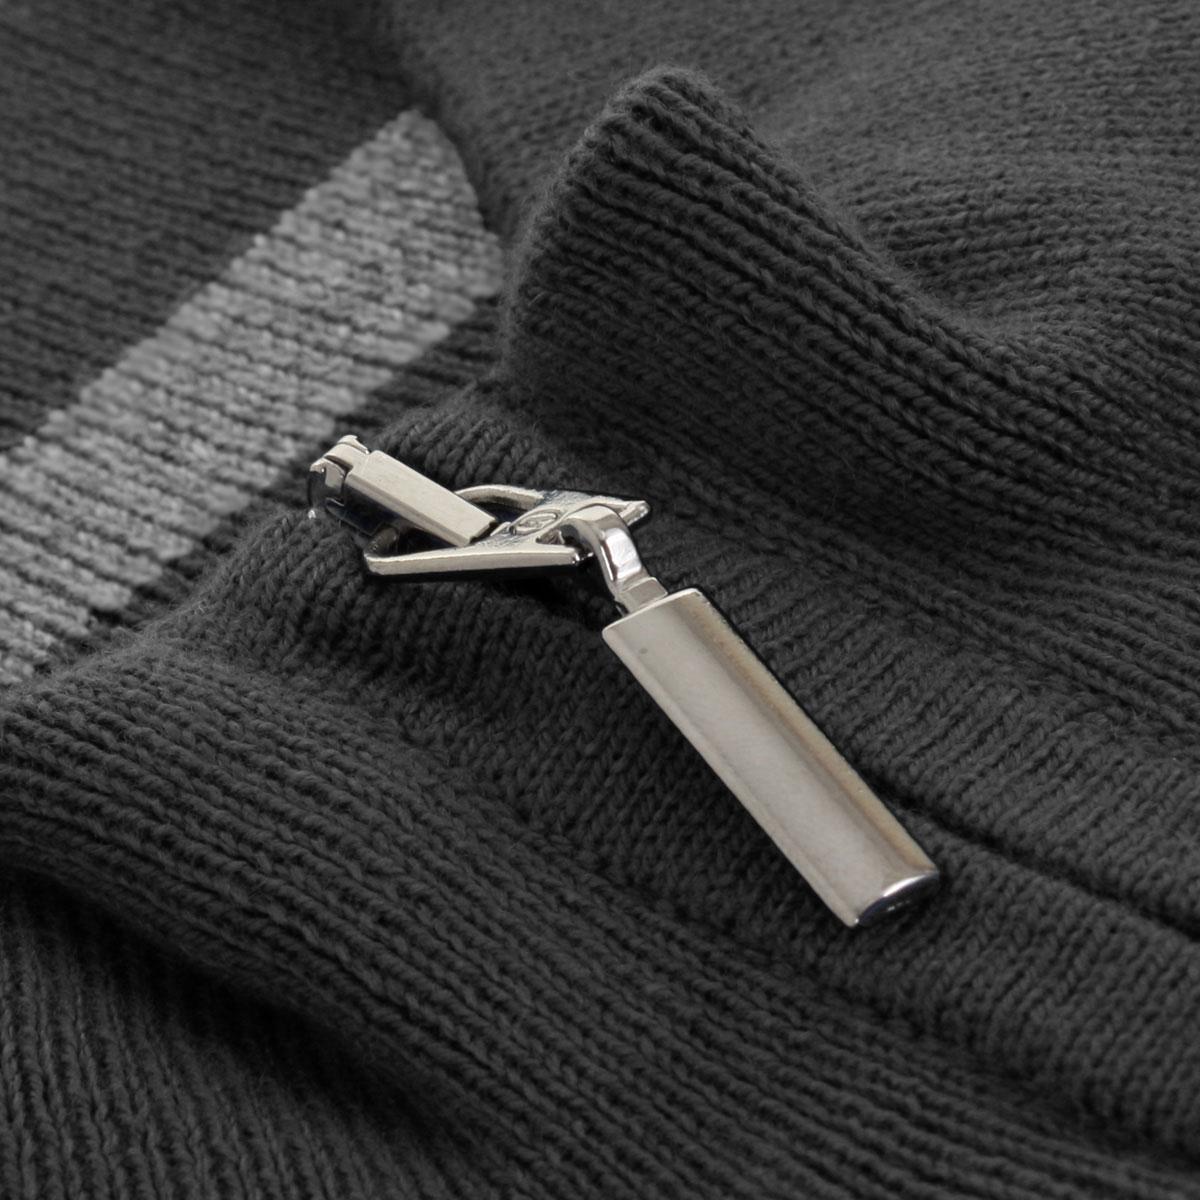 Calvin-Klein-Golf-Mens-CK-1-4-Zip-Sleeveless-Sweater-Vest-Gilet-27-OFF-RRP thumbnail 11